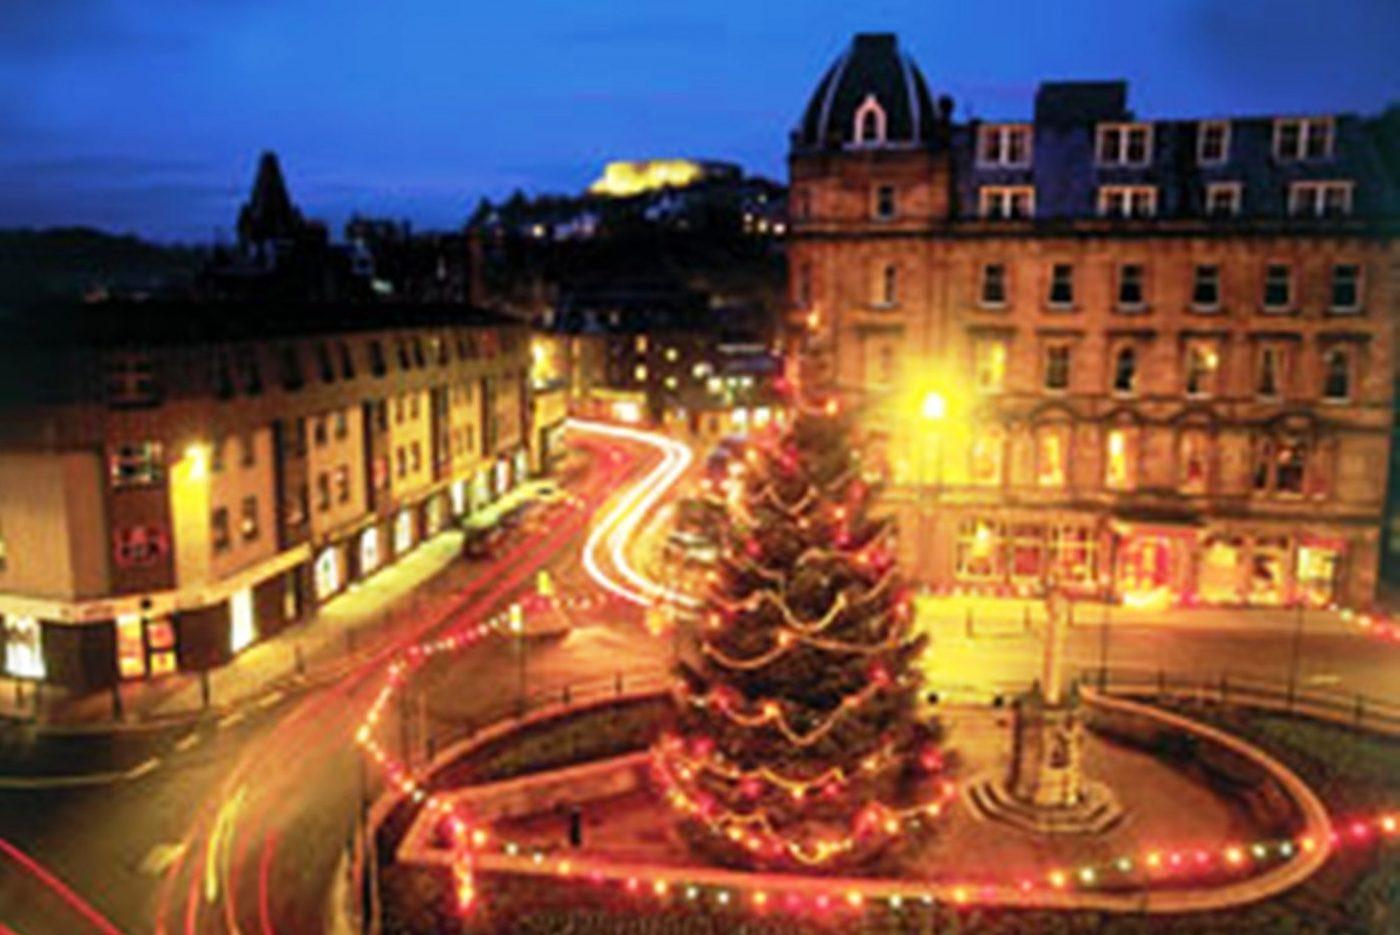 Royal Hotel, Oban, Scotland (Strathmore Hotels) - Exterior at Christmas